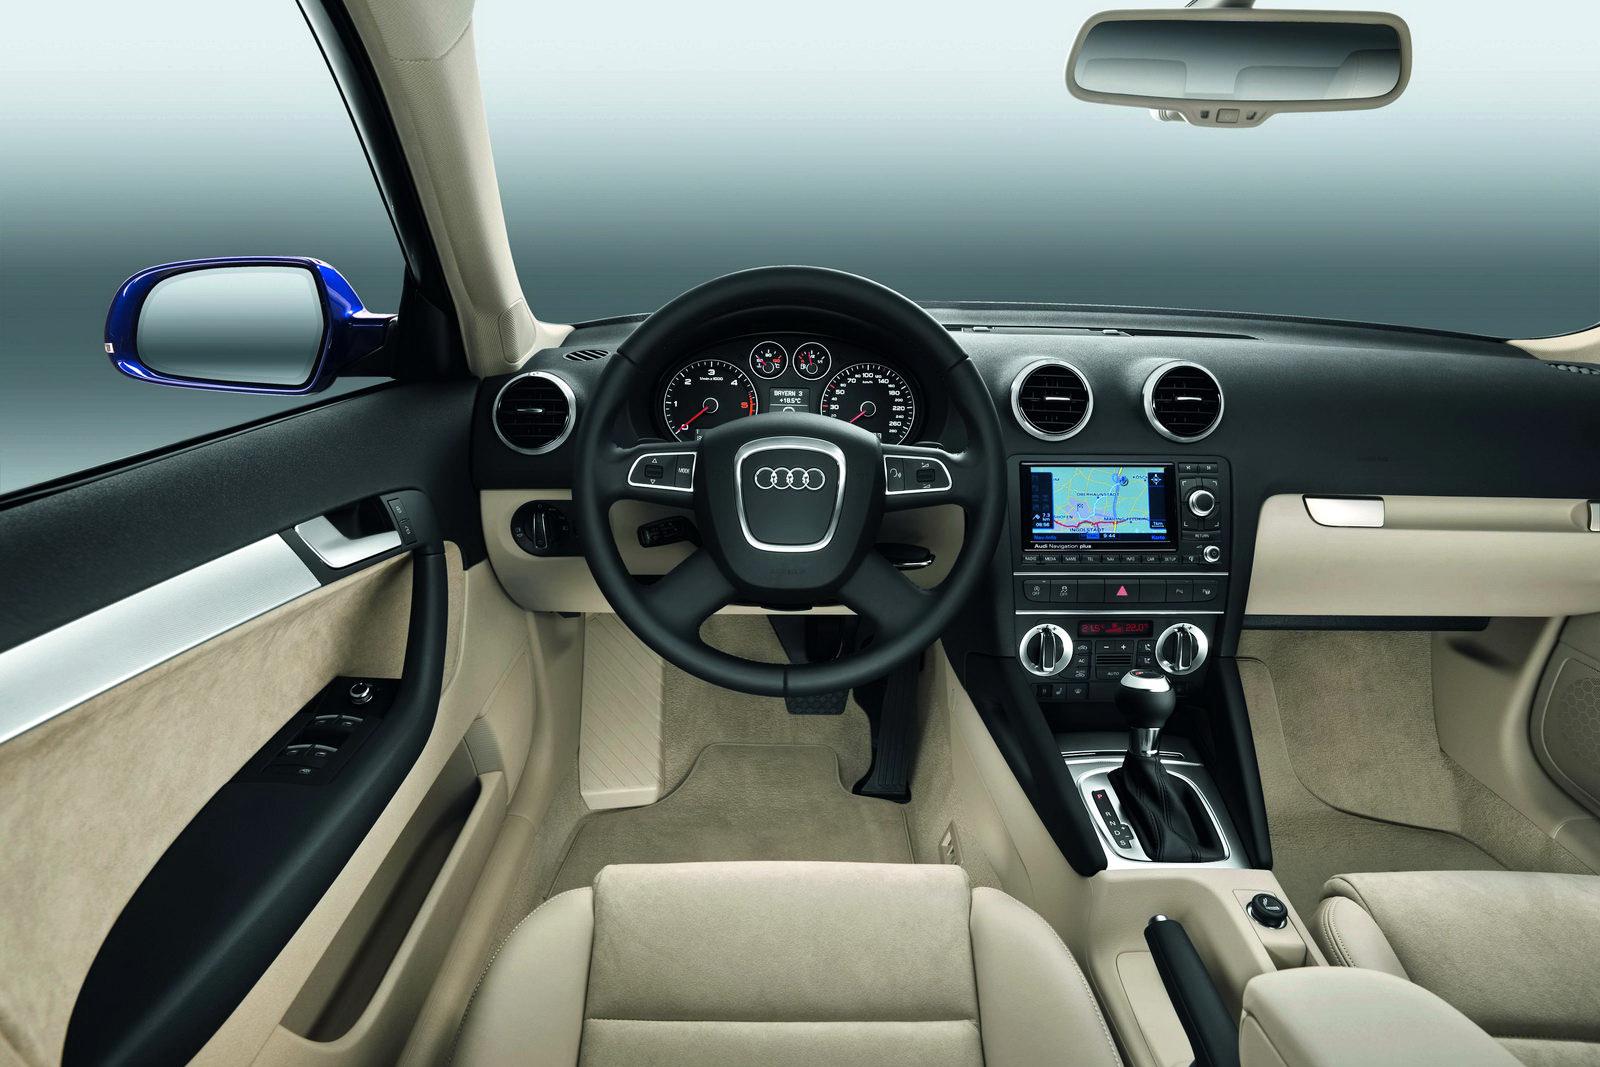 Carscoop Minor Tweaks For 2011 Audi A3 Hatch Sportback